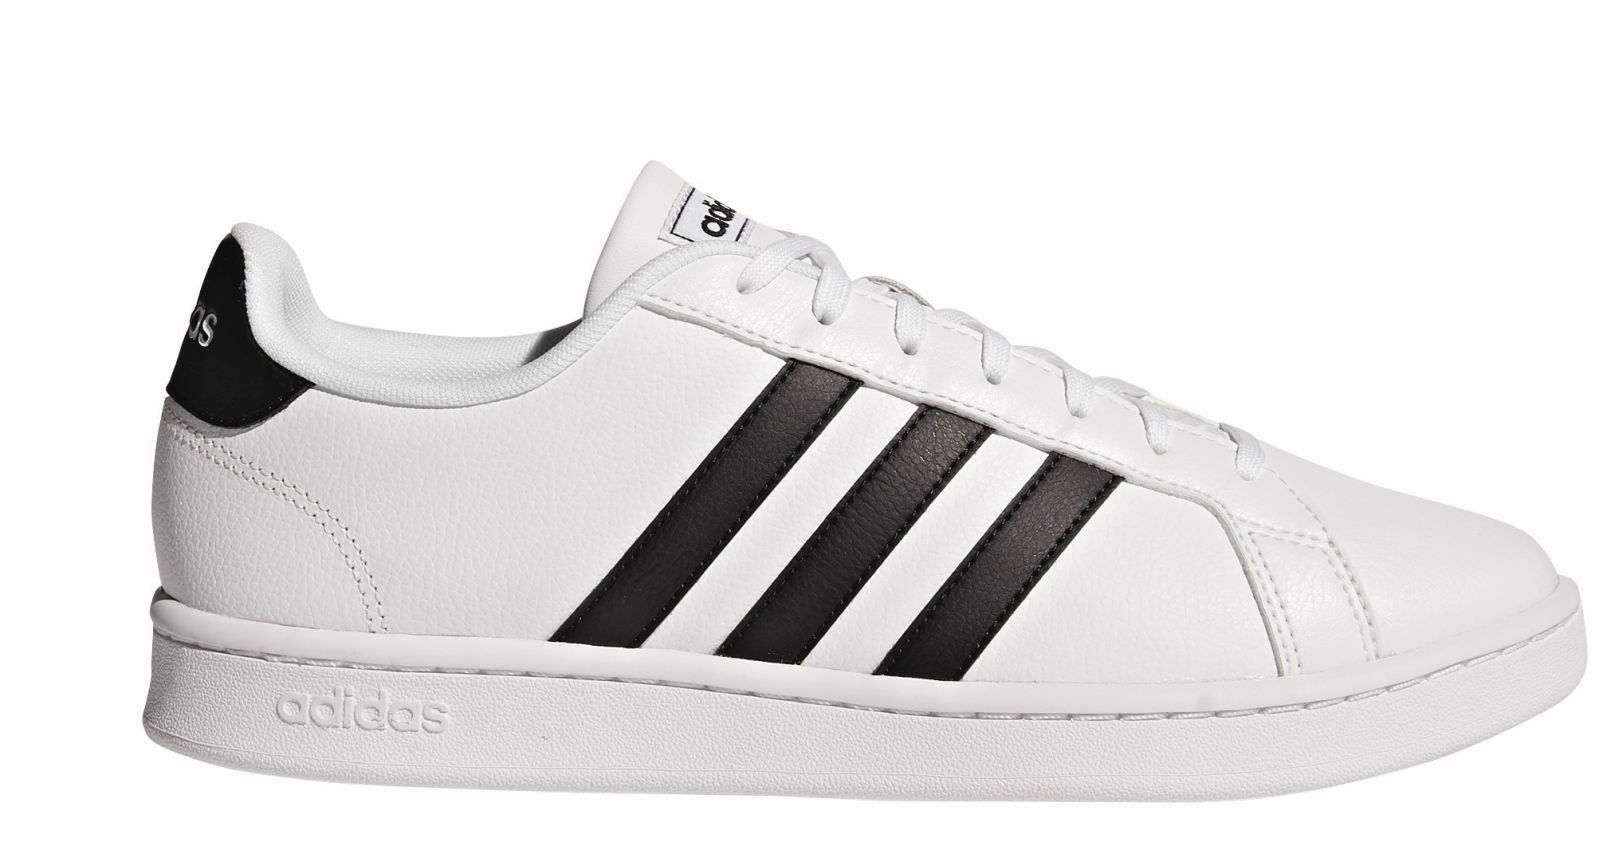 b95300c4bcf6c Adidas Core Men s Recreational and Fitness Grand Court shoes  npsmtj8055-Athletic Shoes - fishing.xlri-xlerate.com